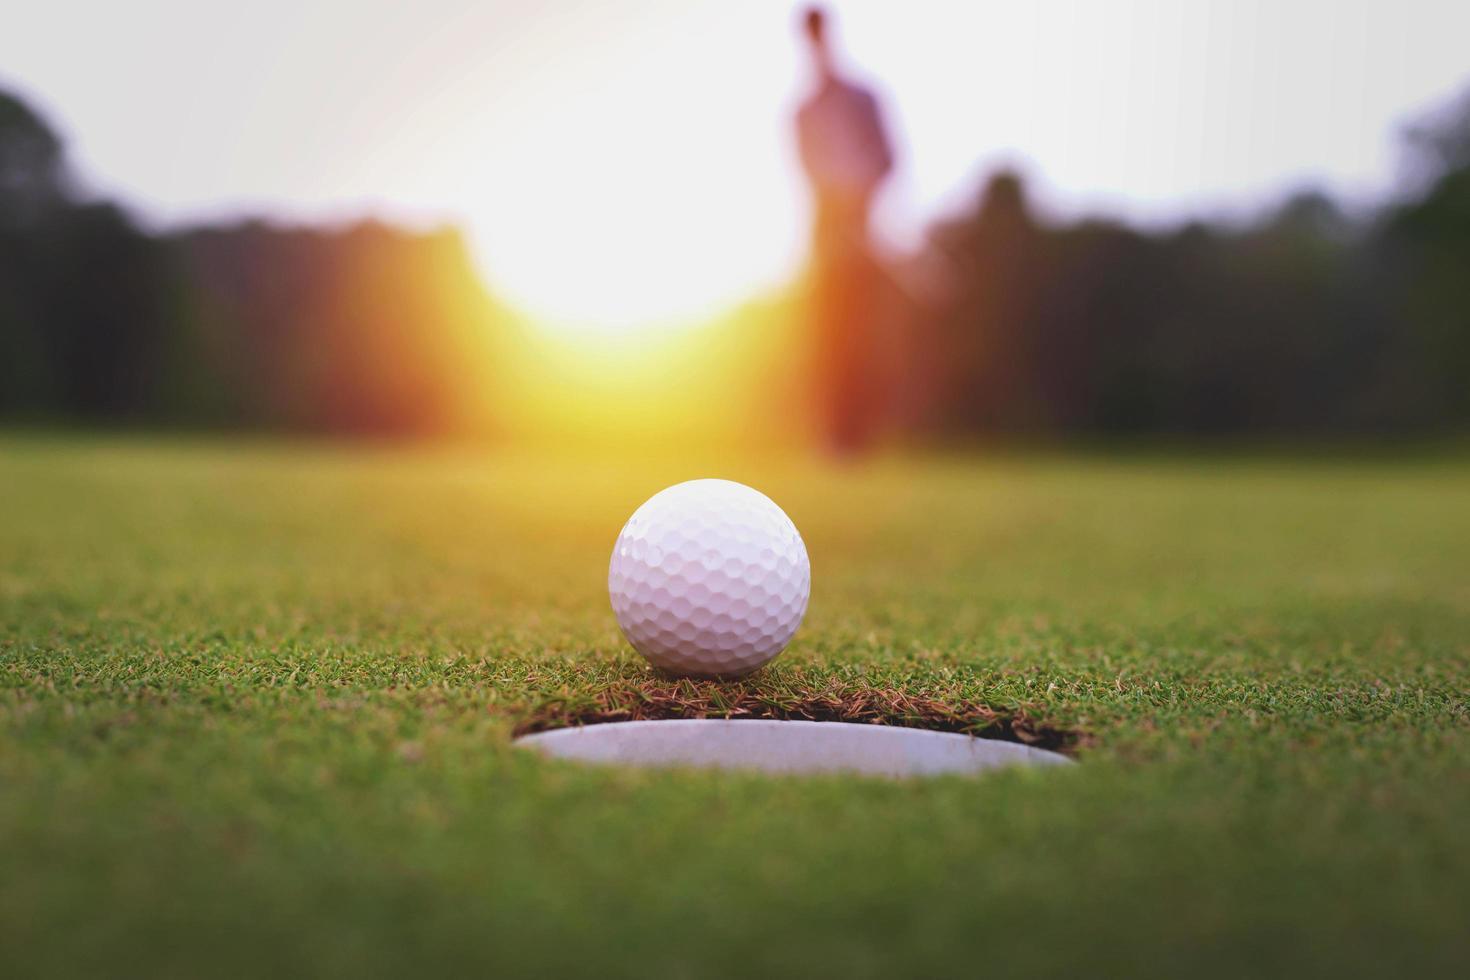 A person behind a golf ball on a green grass field photo